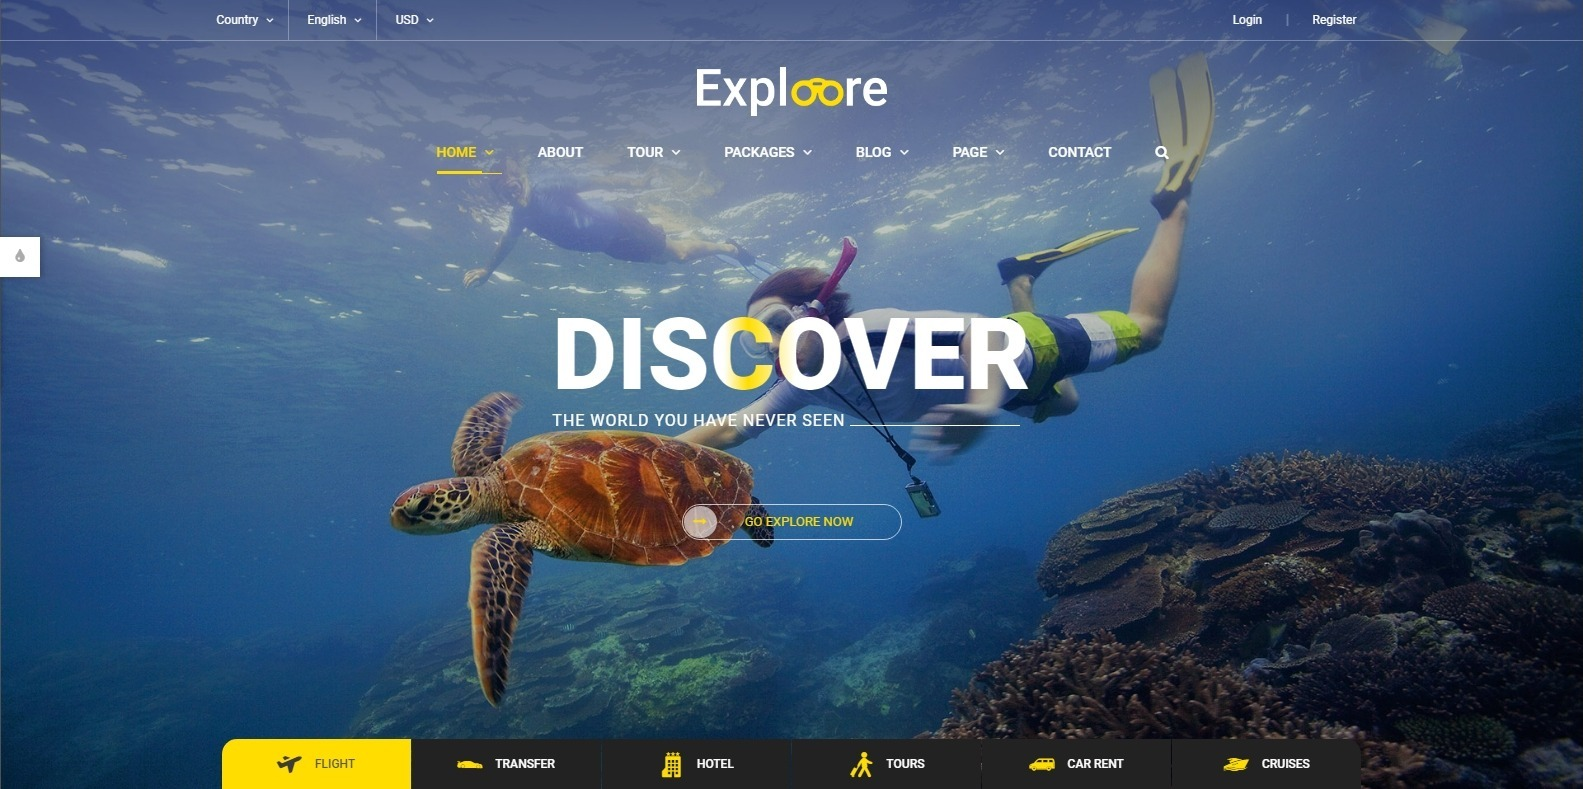 exploore-travel-website-template